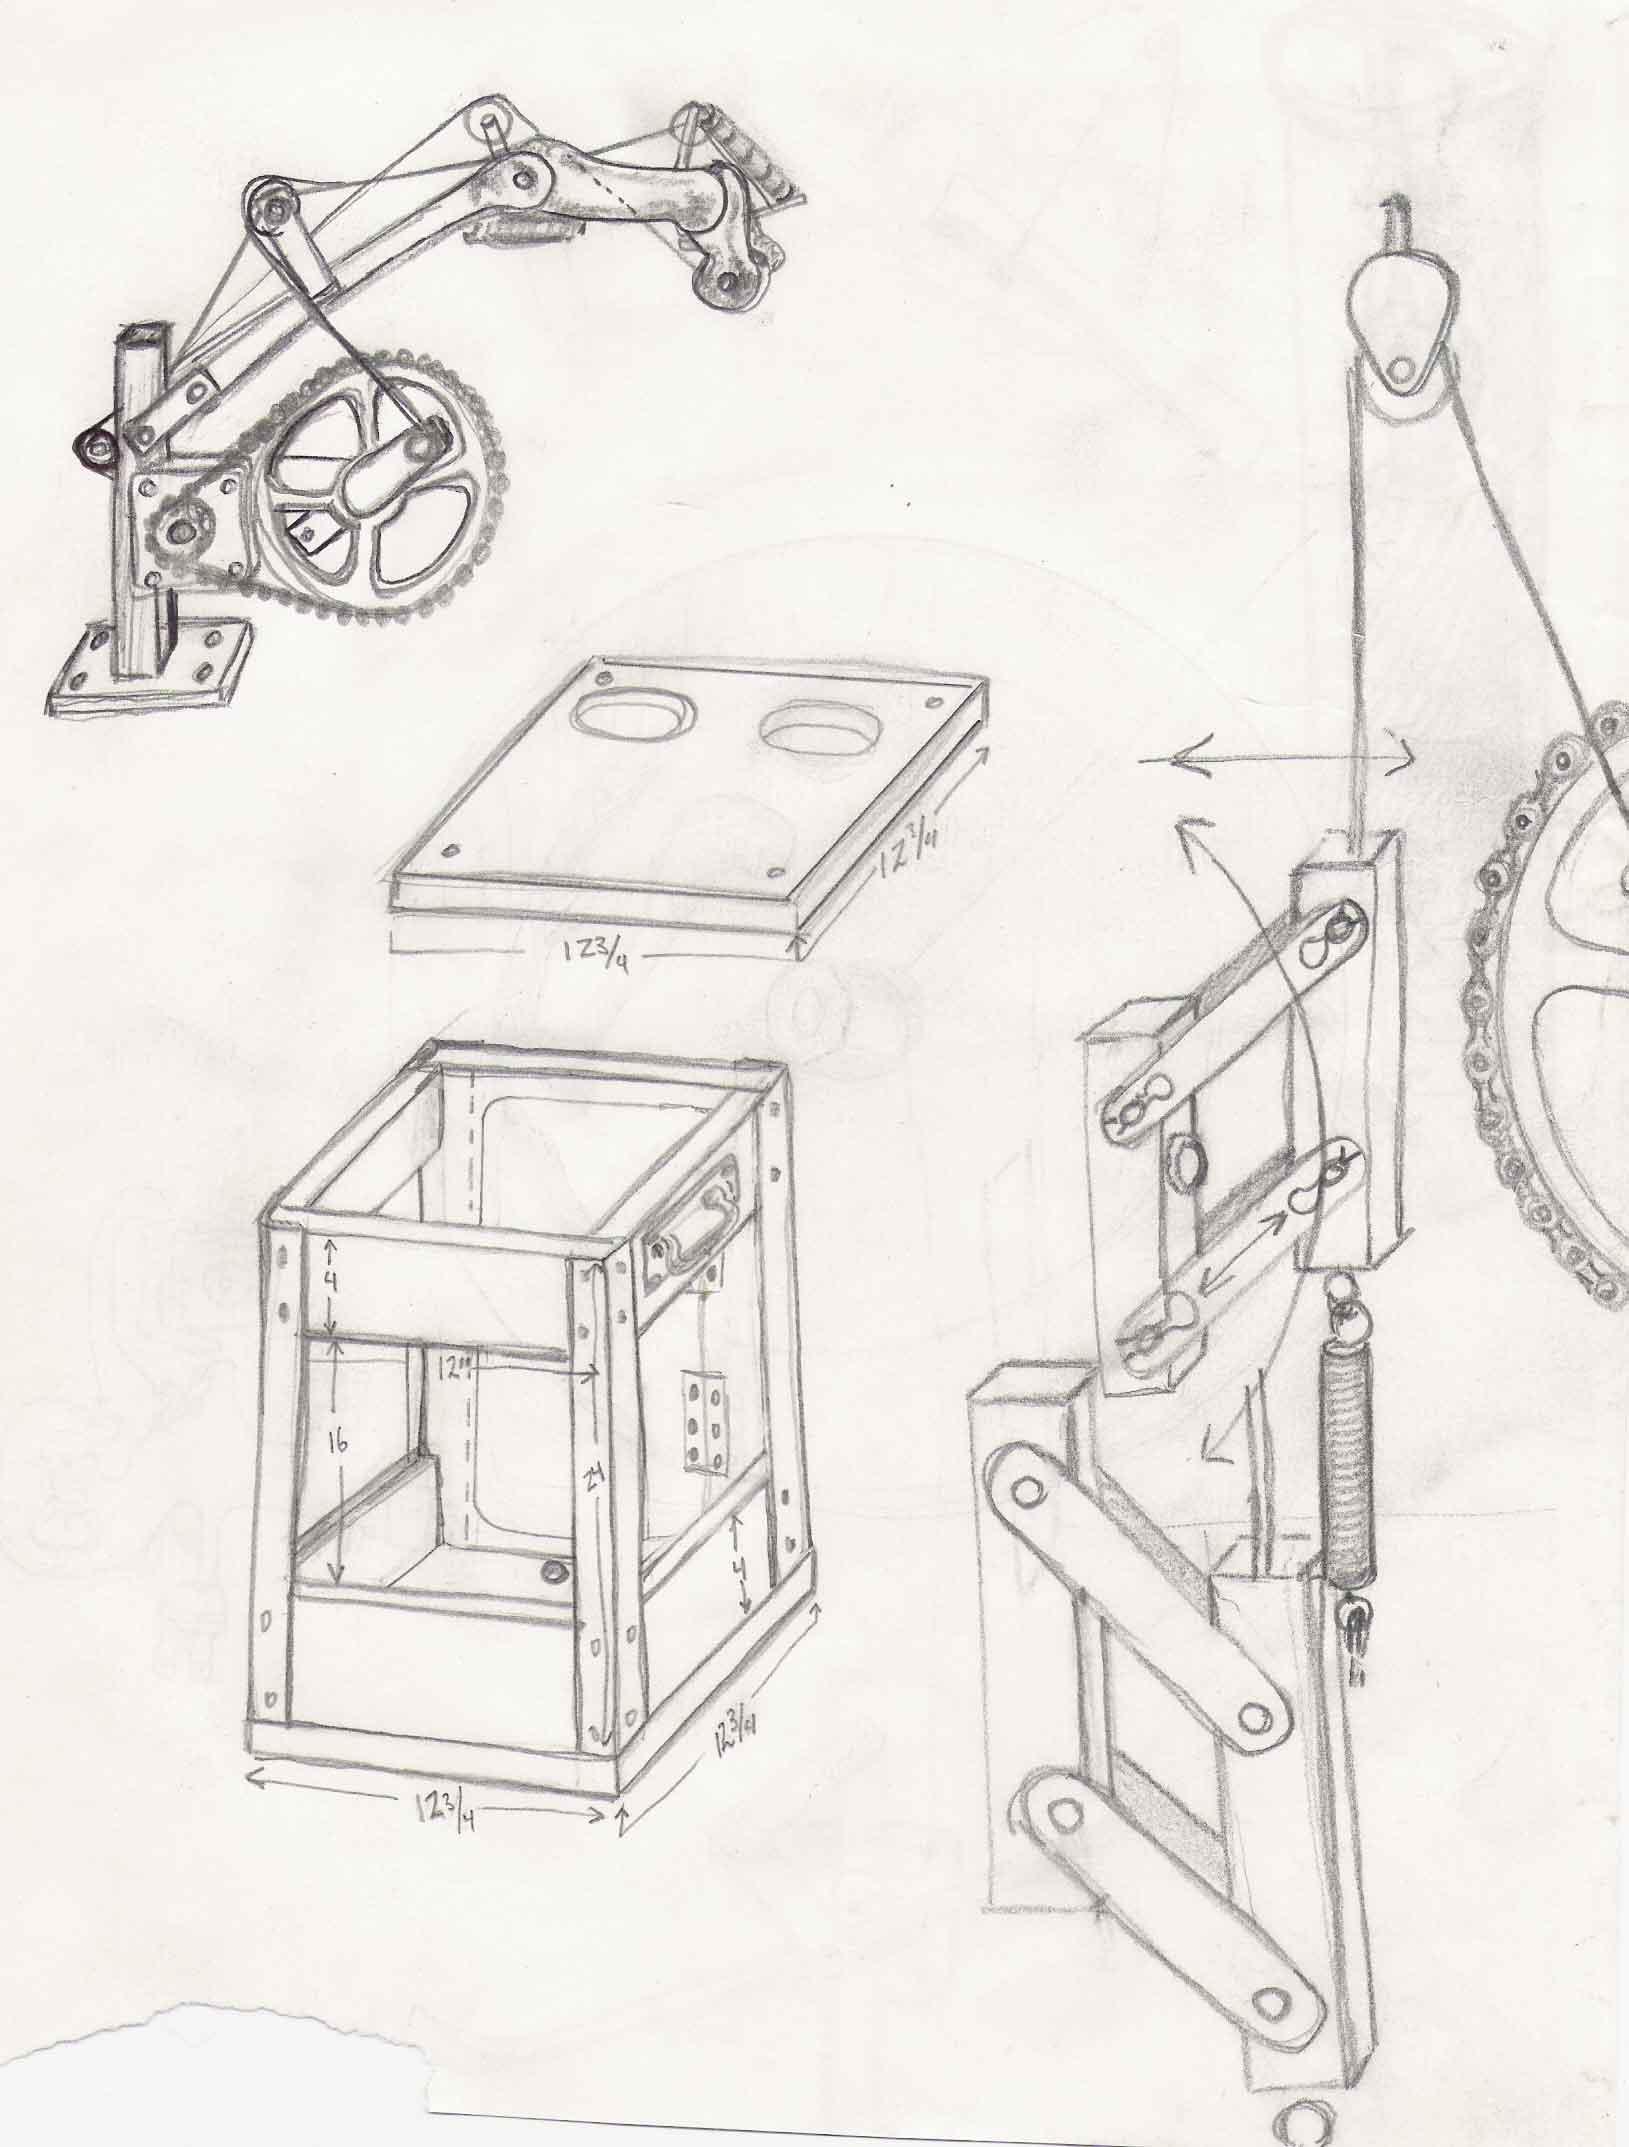 sketch-38-sept-05.jpg